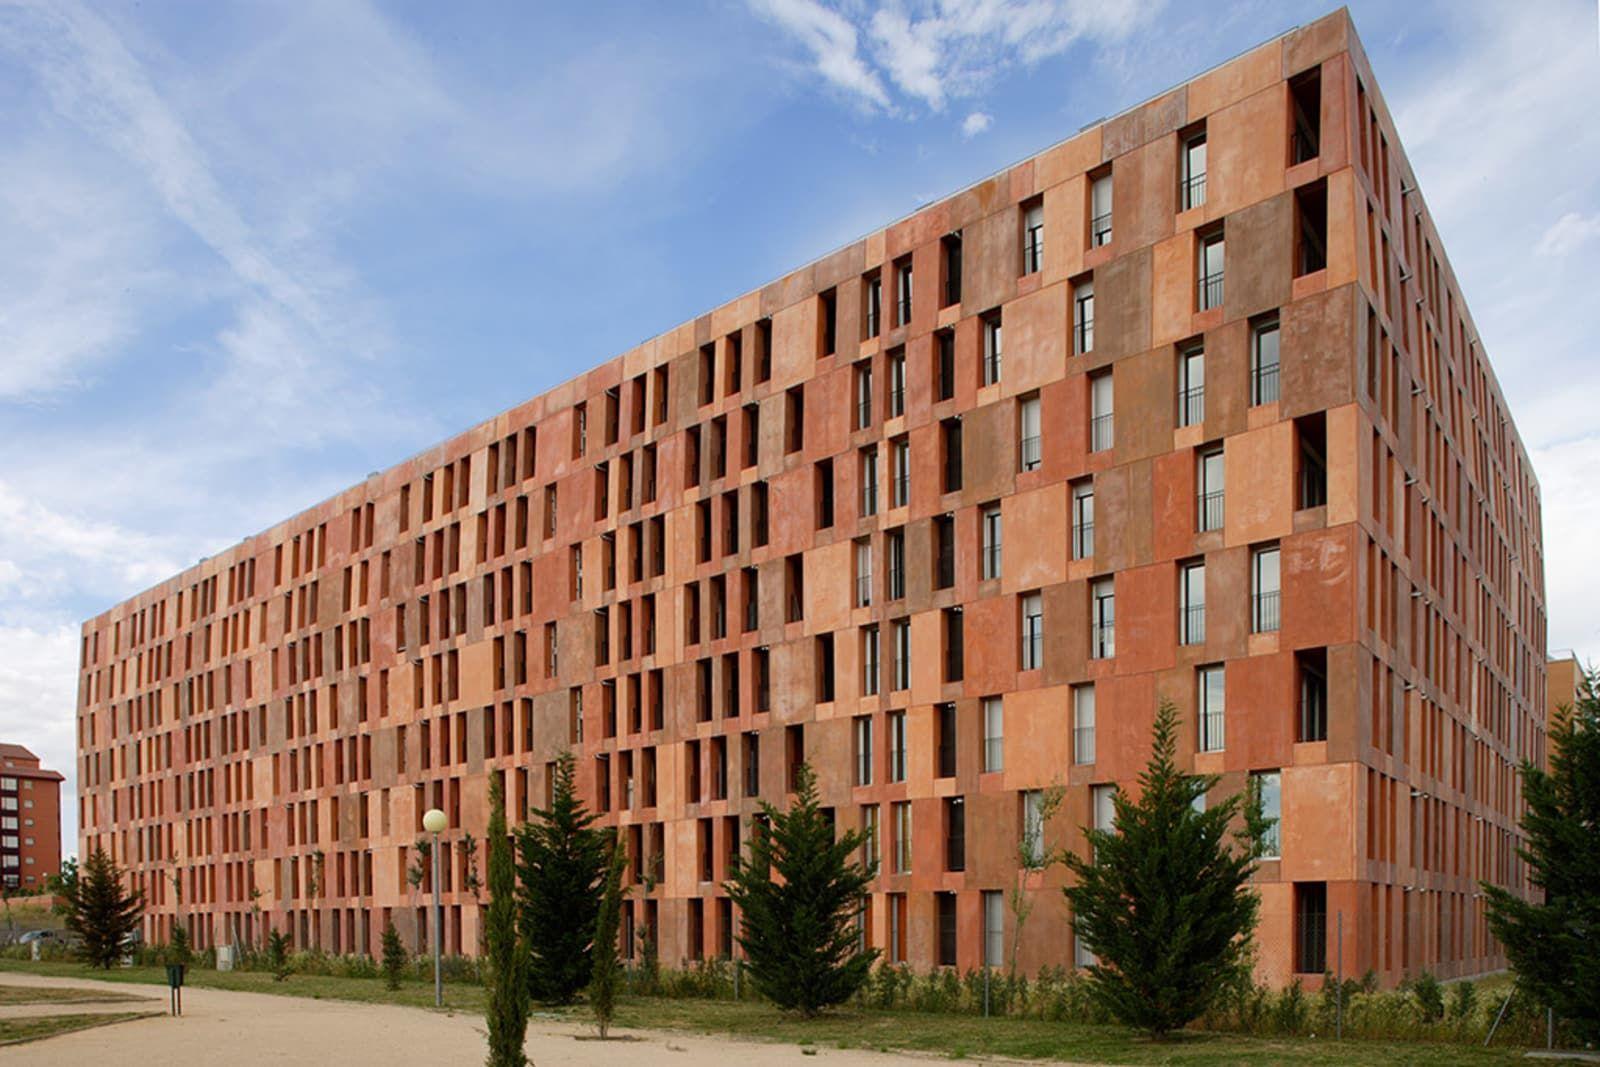 David Chipperfield Architects Miguel De Guzman Housing Villaverde Madrid David Chipperfield Architects Architecture Architect